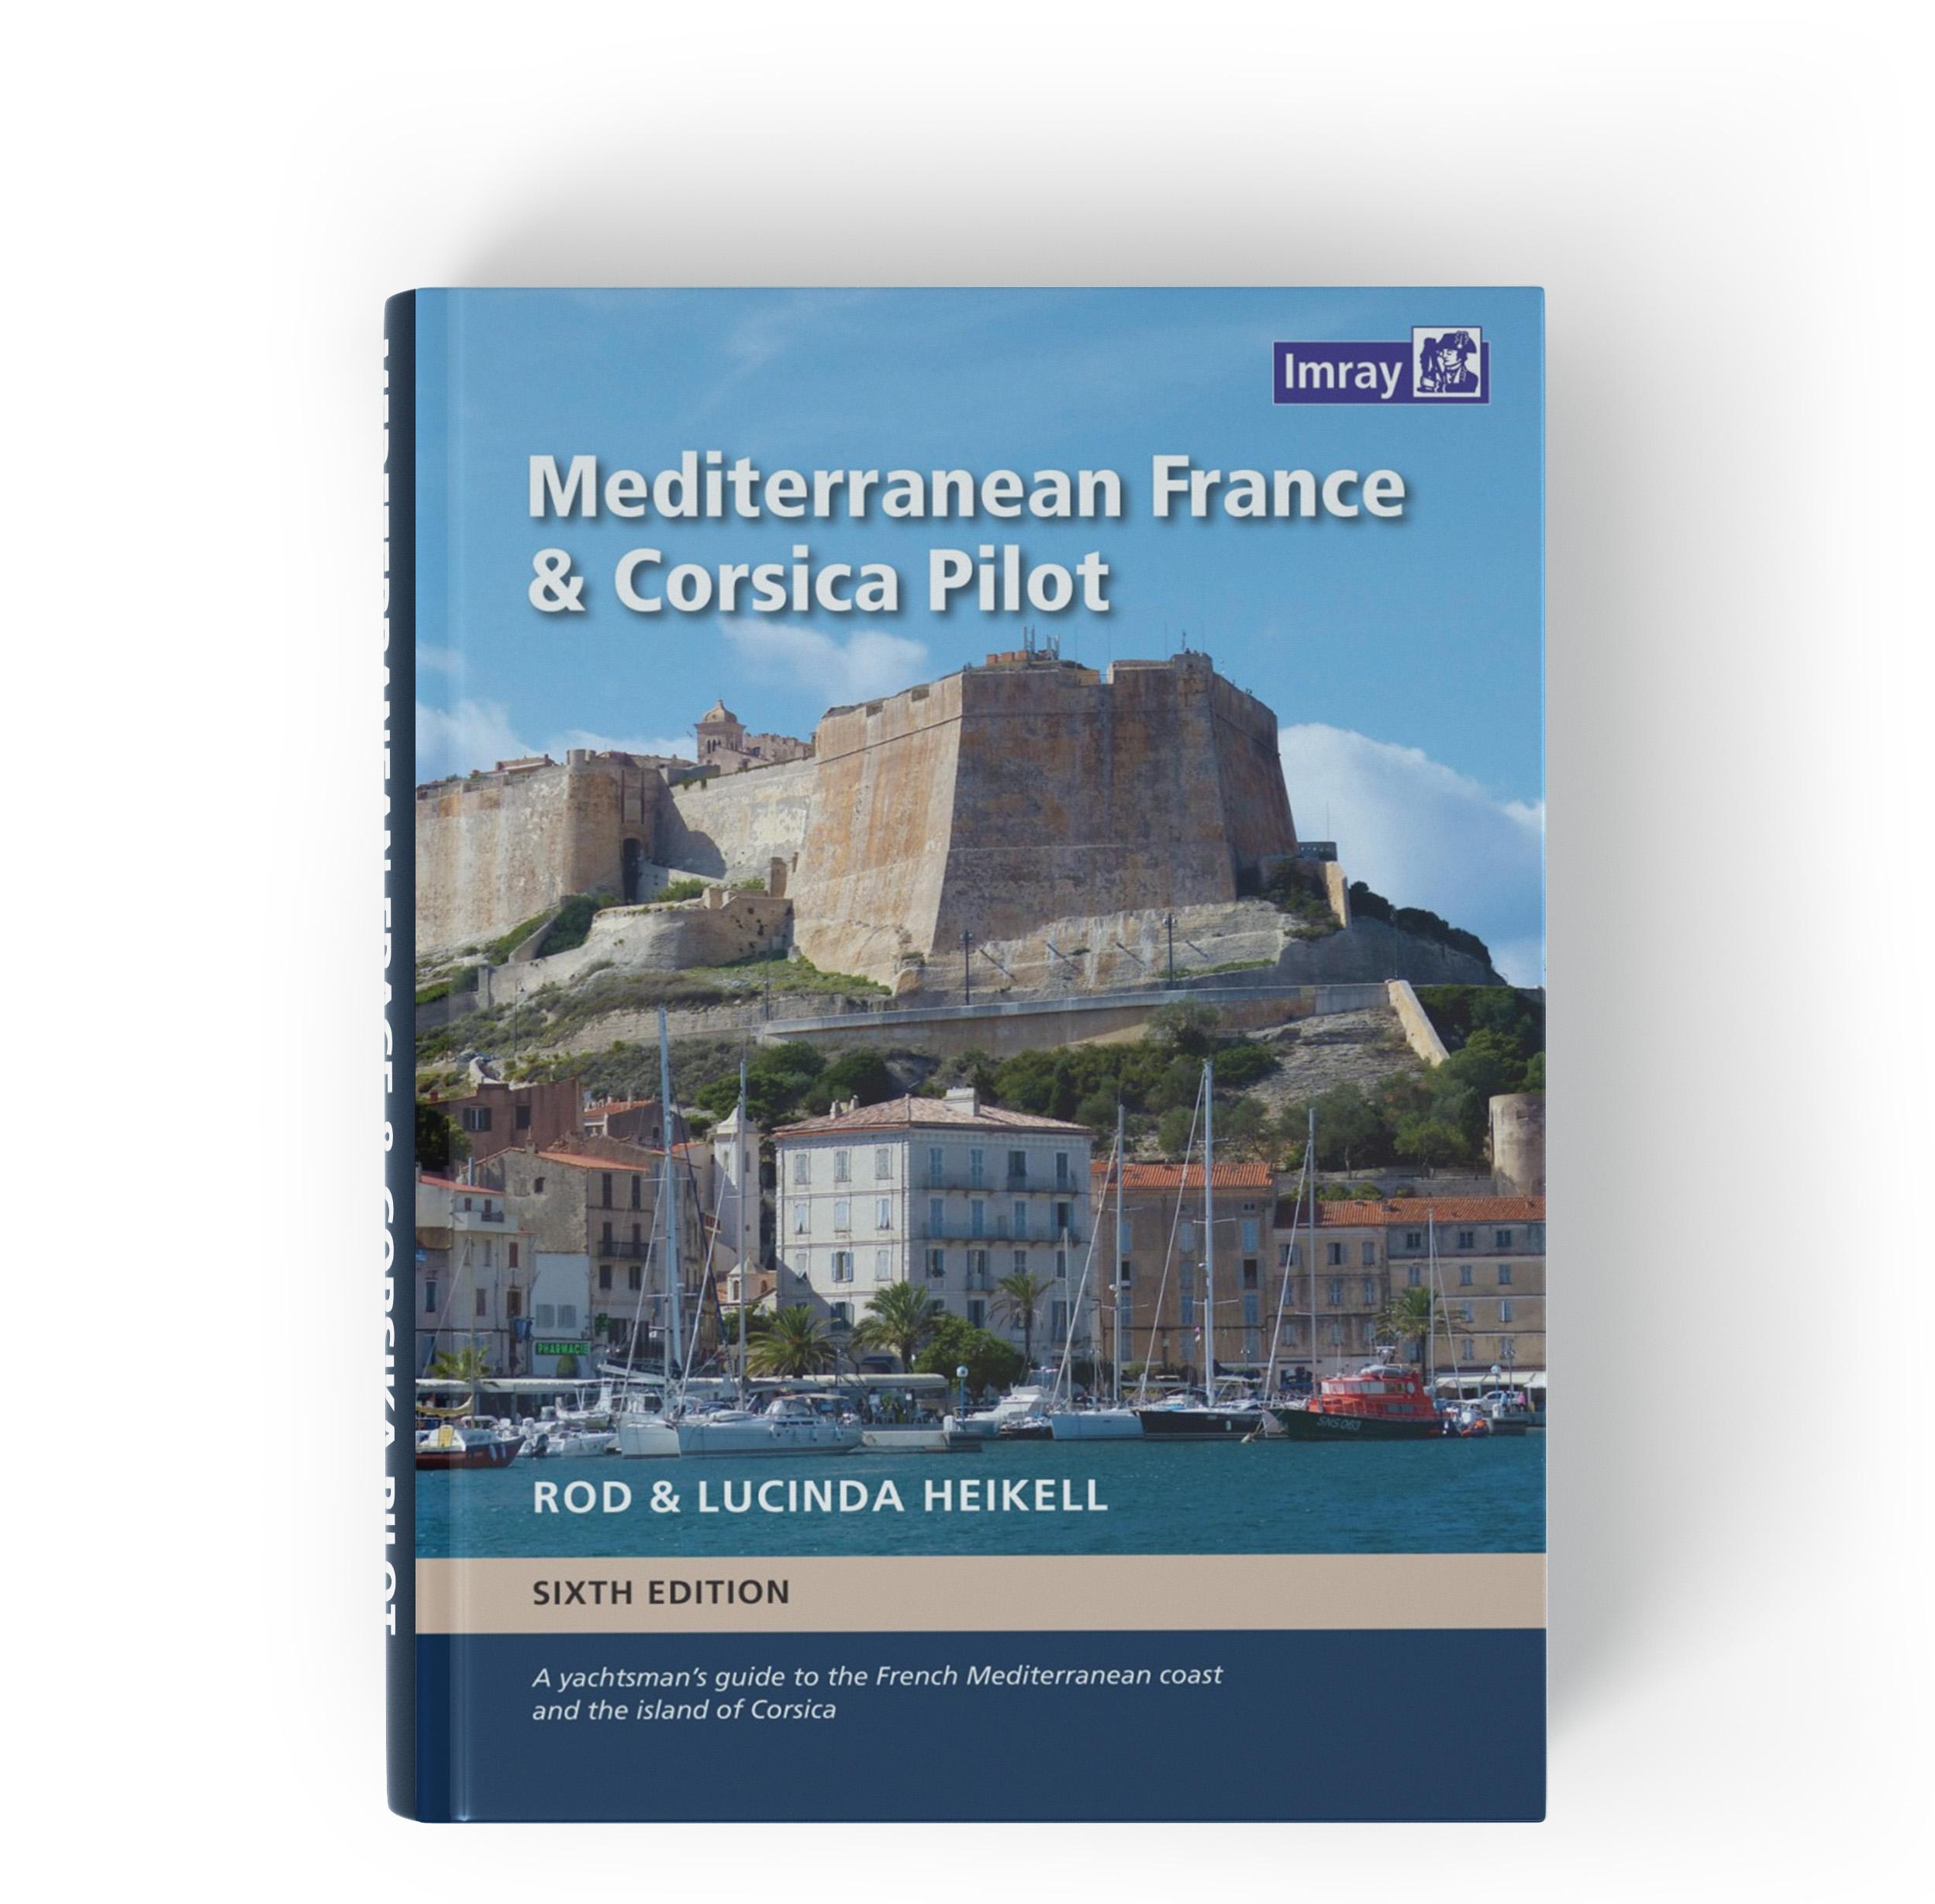 Mediterranean France and Corsica Pilot